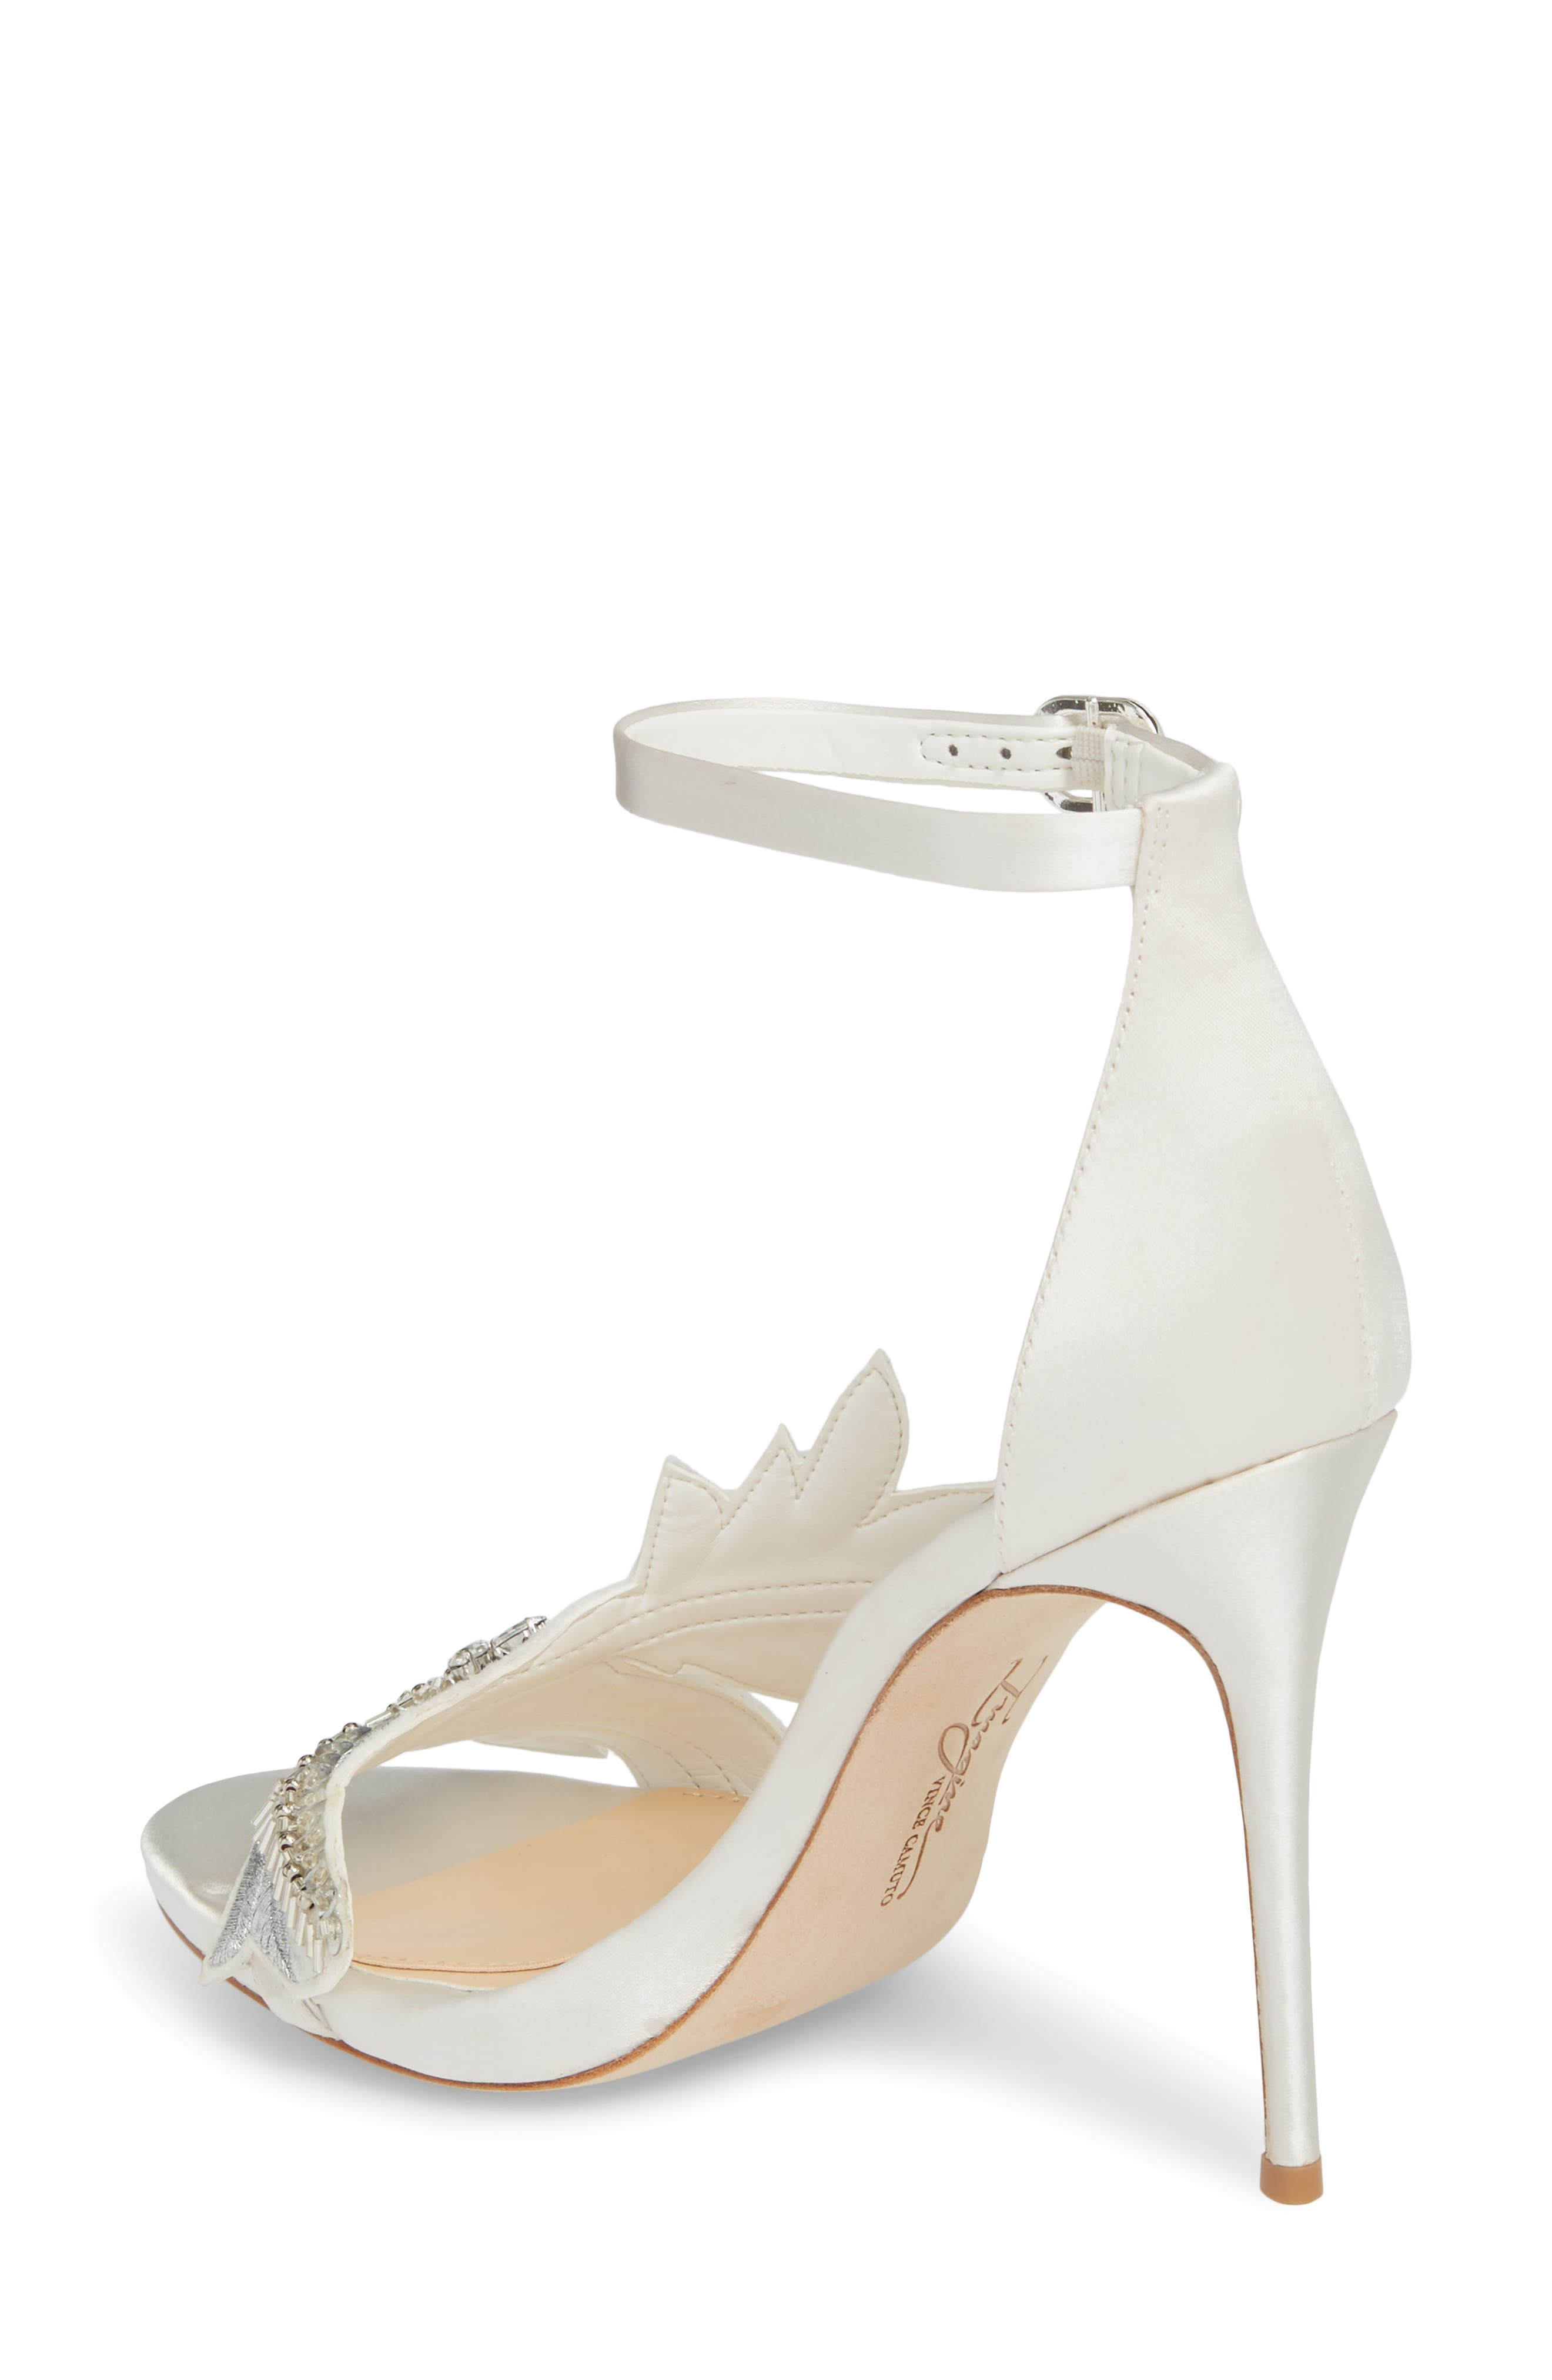 Imagine Vince Camuto Dayanara Embellished Sandal,                             Alternate thumbnail 2, color,                             PURE WHITE SATIN